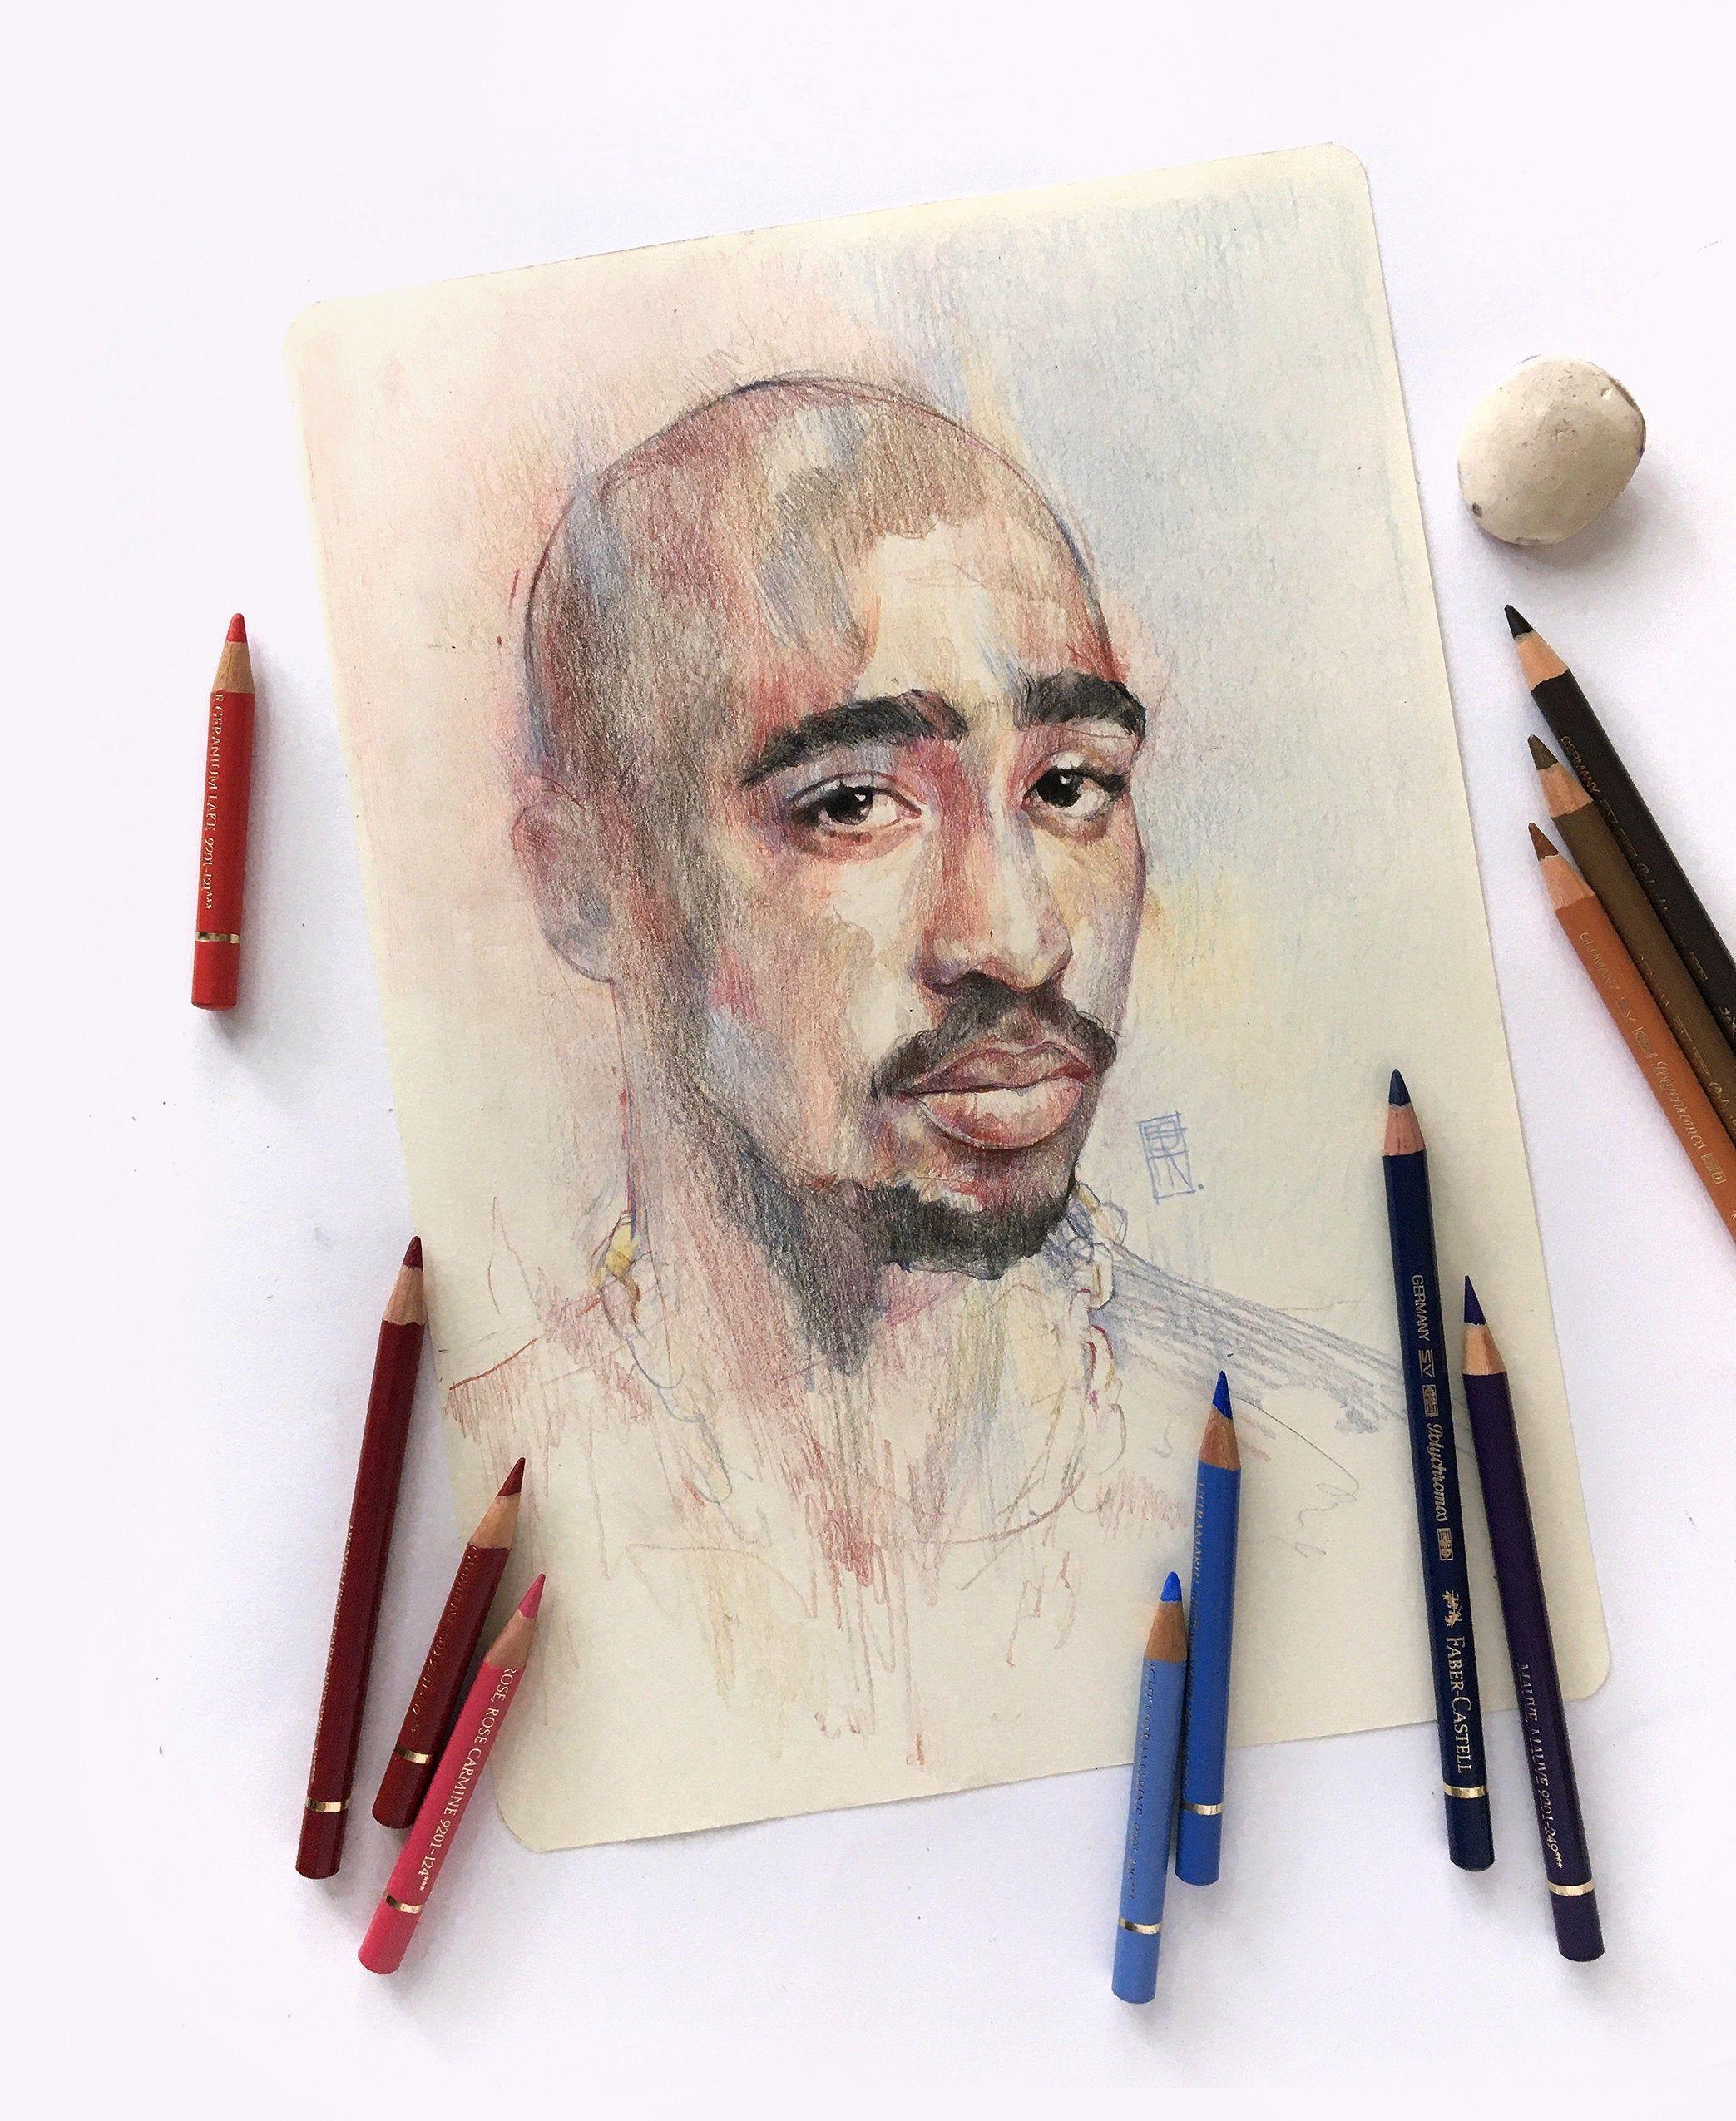 2pac Shakur Original Drawing Hand Made Color Pencil Artwork Etsy In 2020 Colored Pencil Artwork Art Color Pencil Art